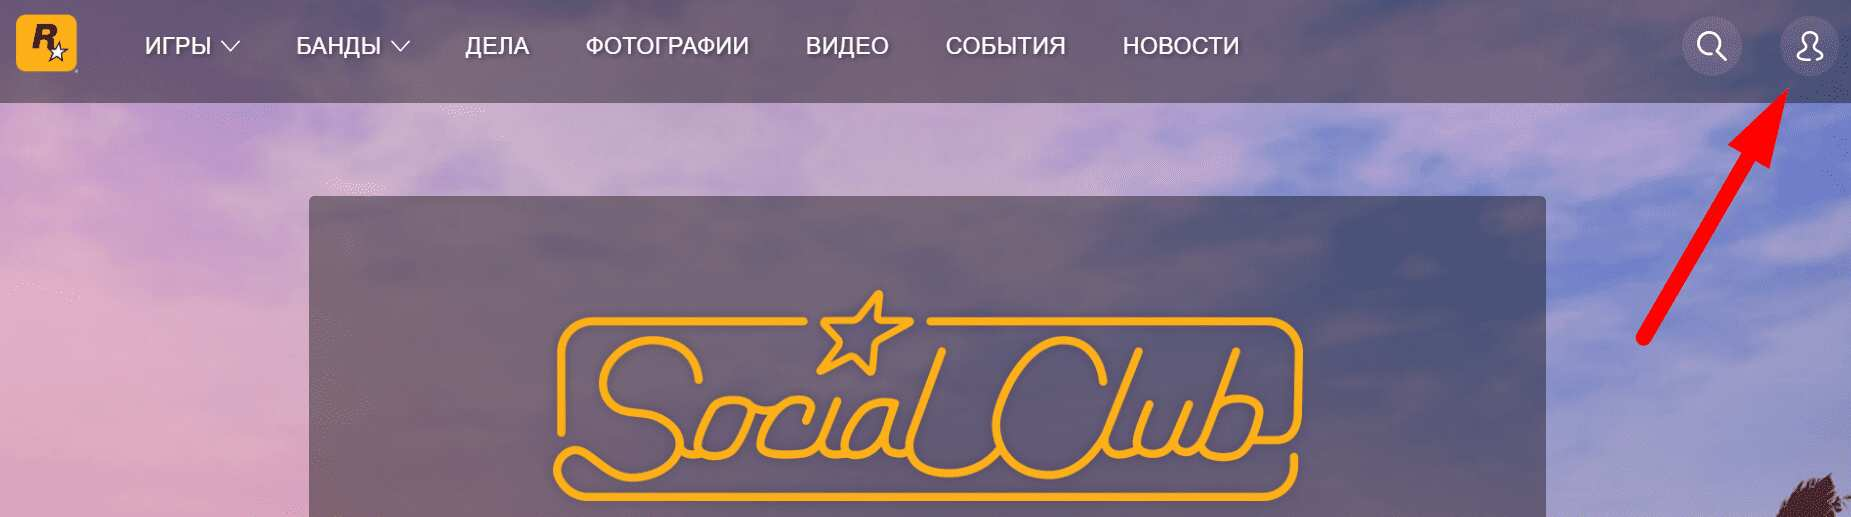 Ссылка на сайт платформы «РокСтар»